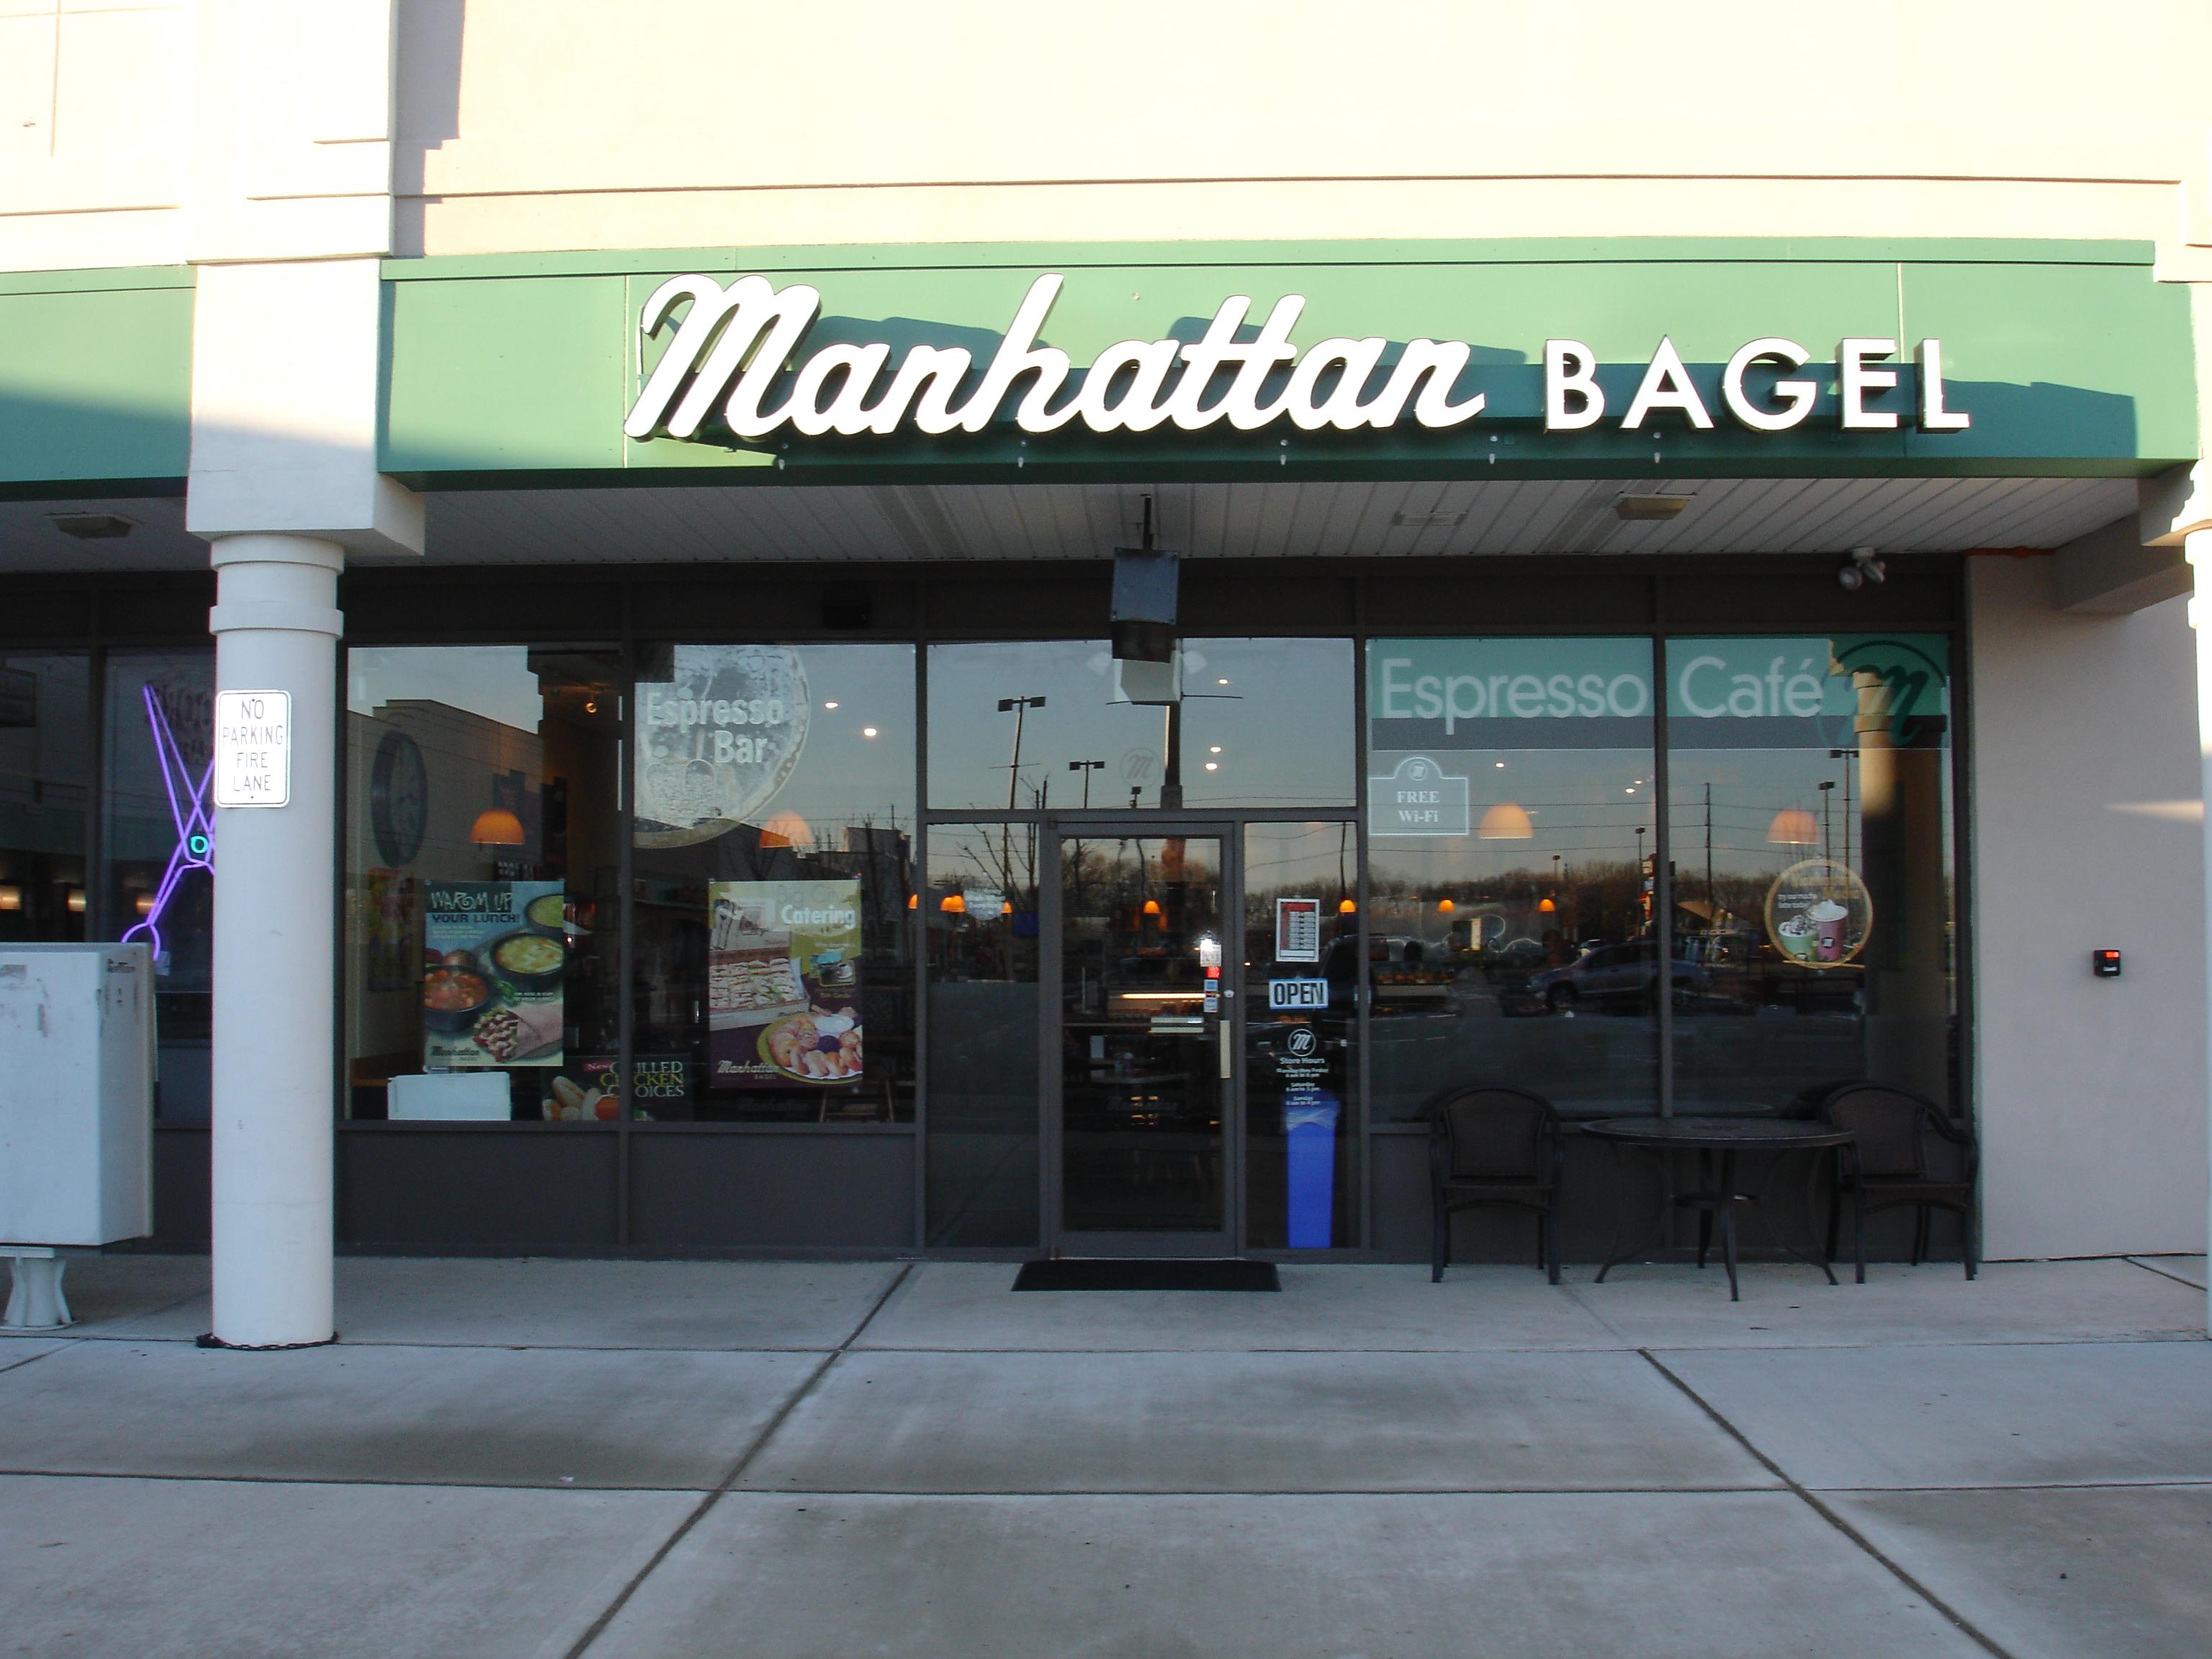 Manhattan Bagel, Manahawkin NJ